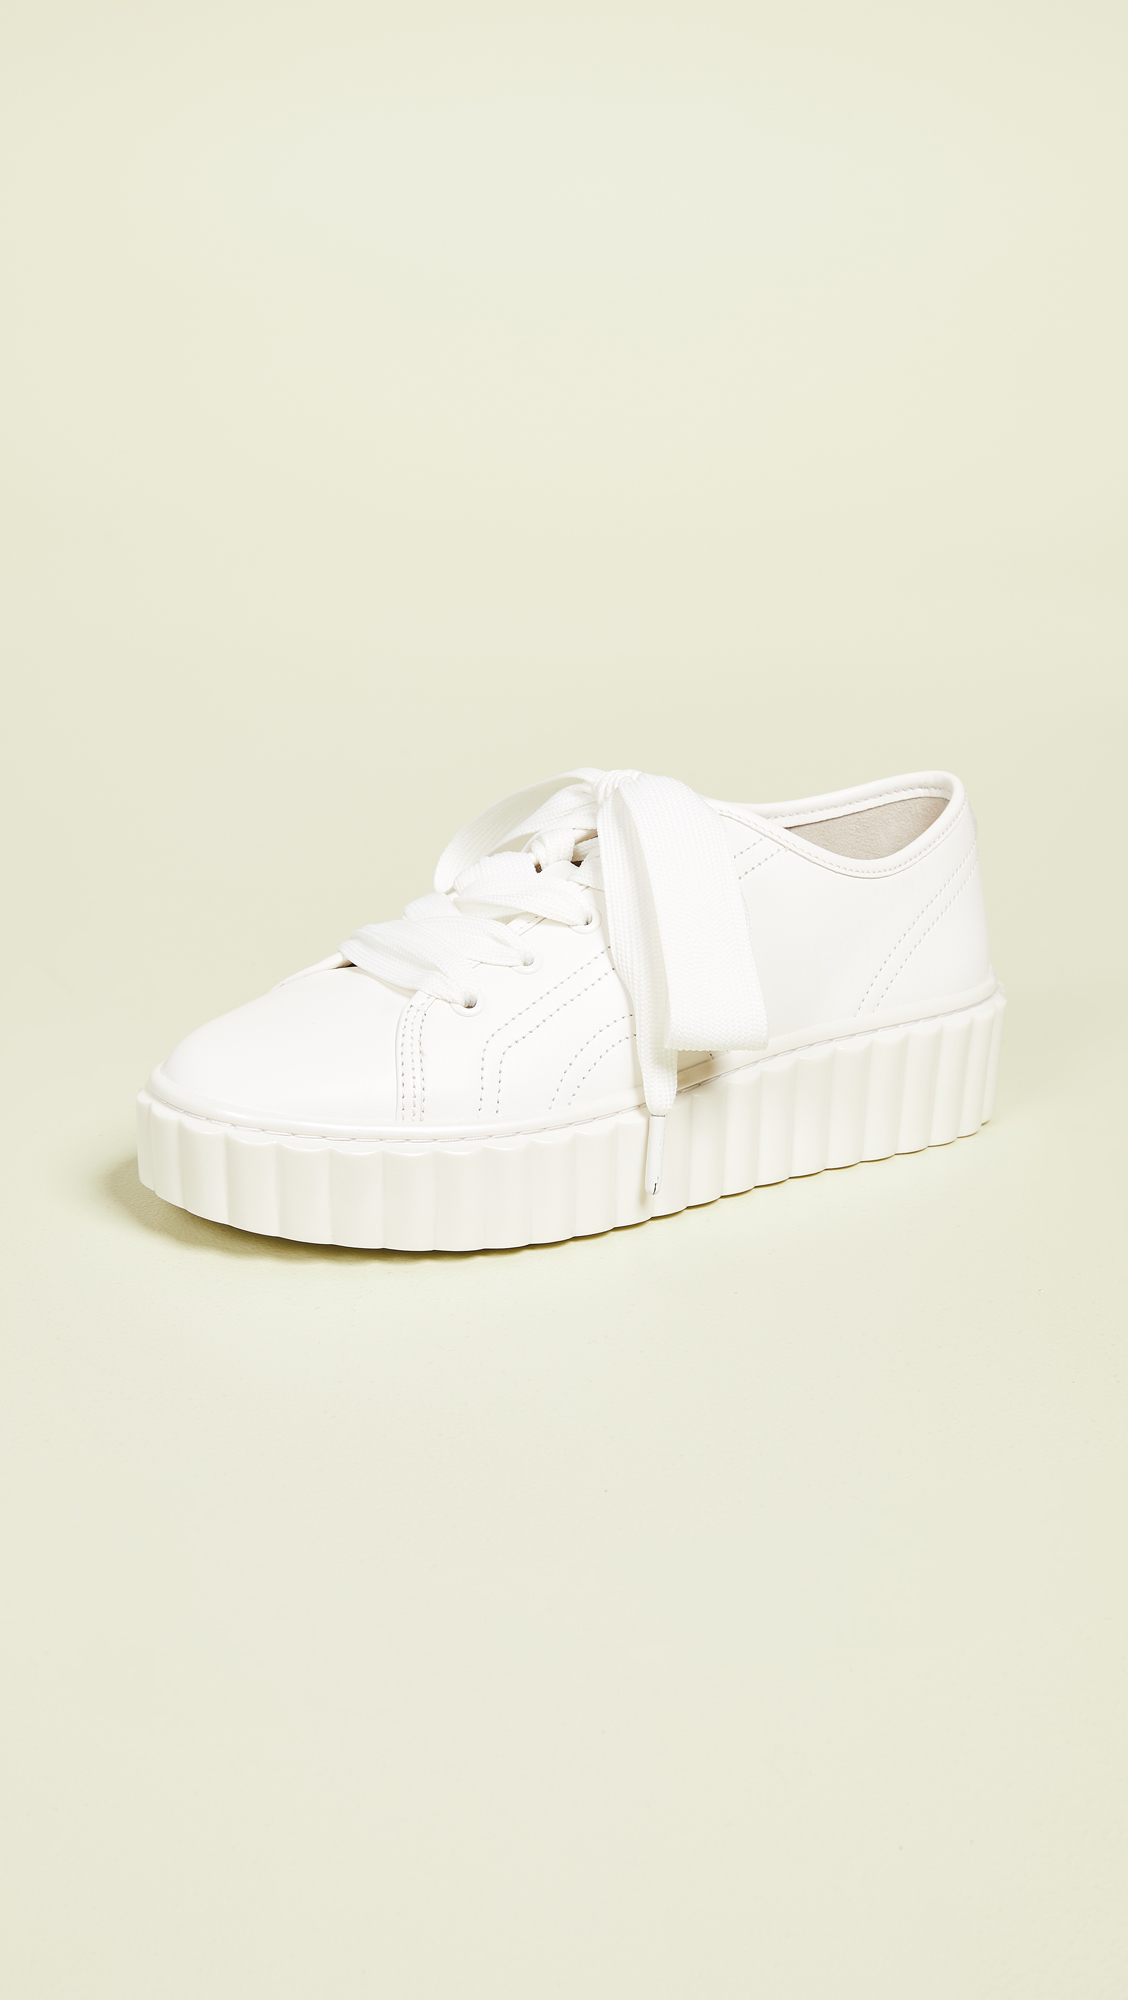 4a9475efa09c7f Tory Burch Scallop Sneakers